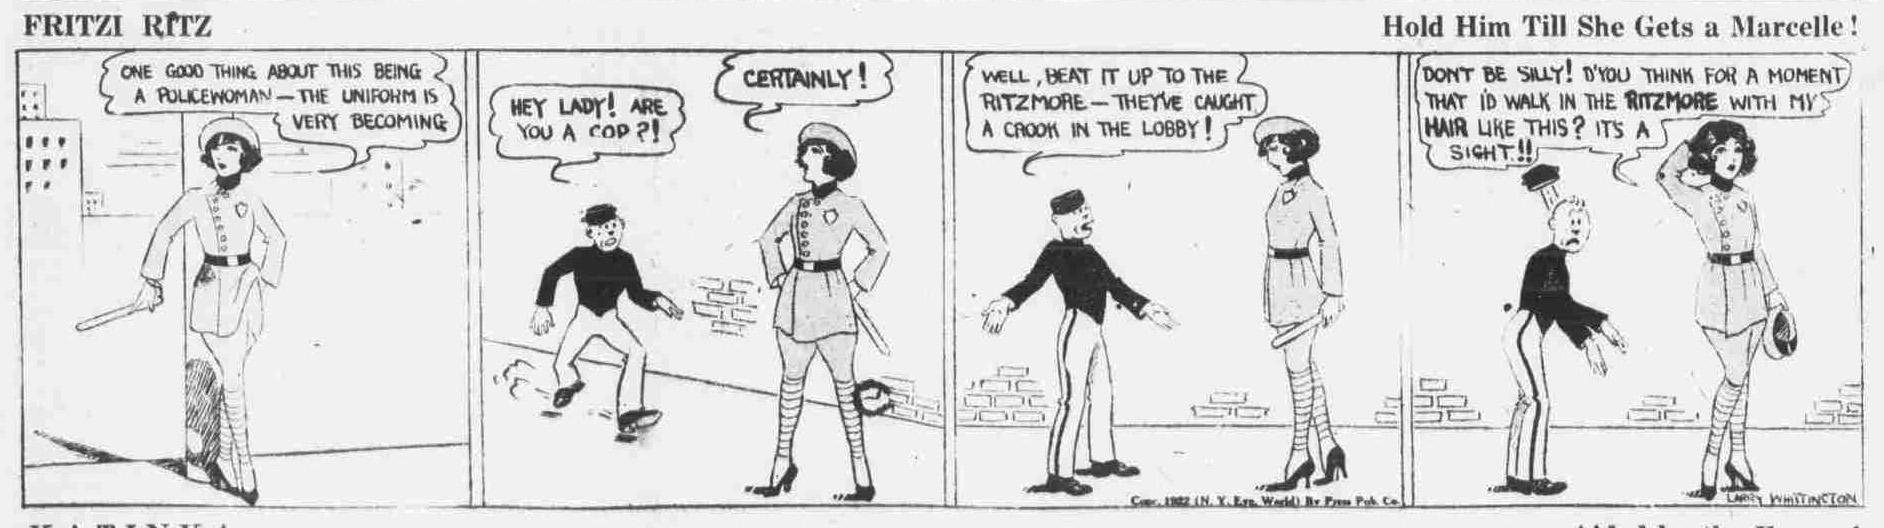 Nov. 7, 1922